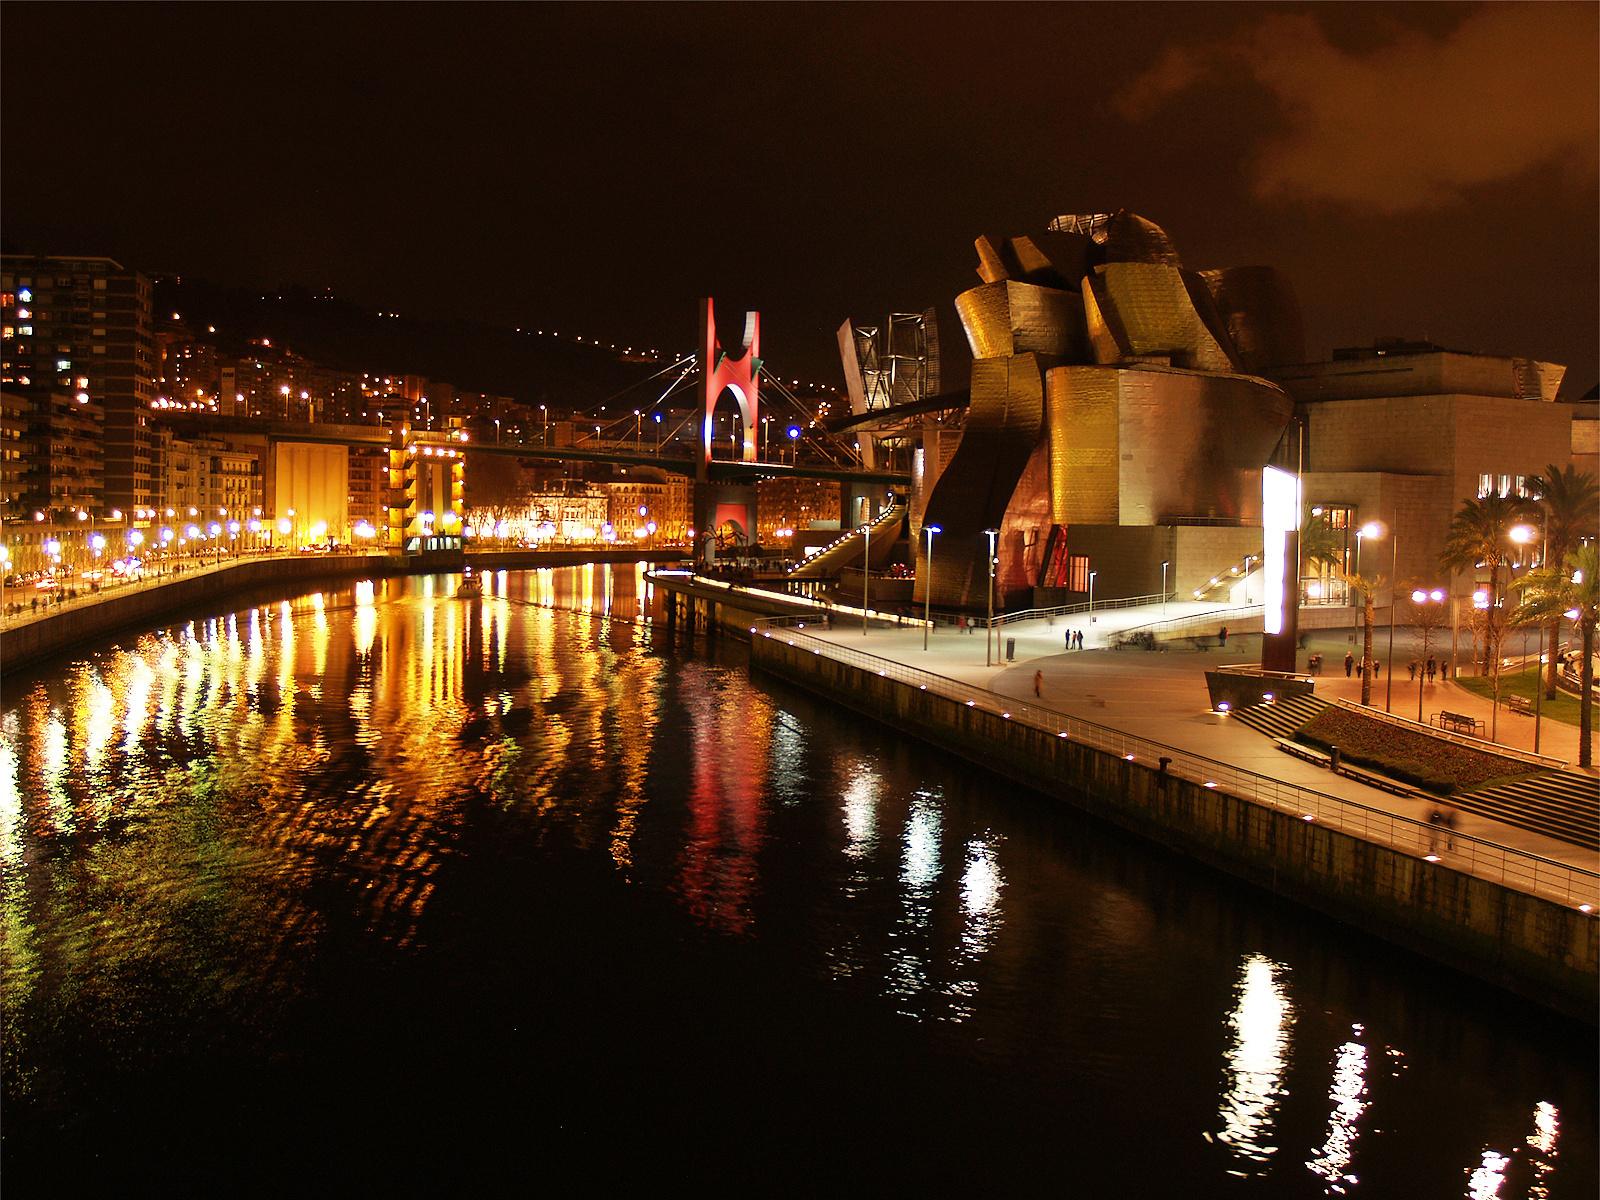 Bilbao Spain Night Wallpapers - 1600x1200 - 1257684